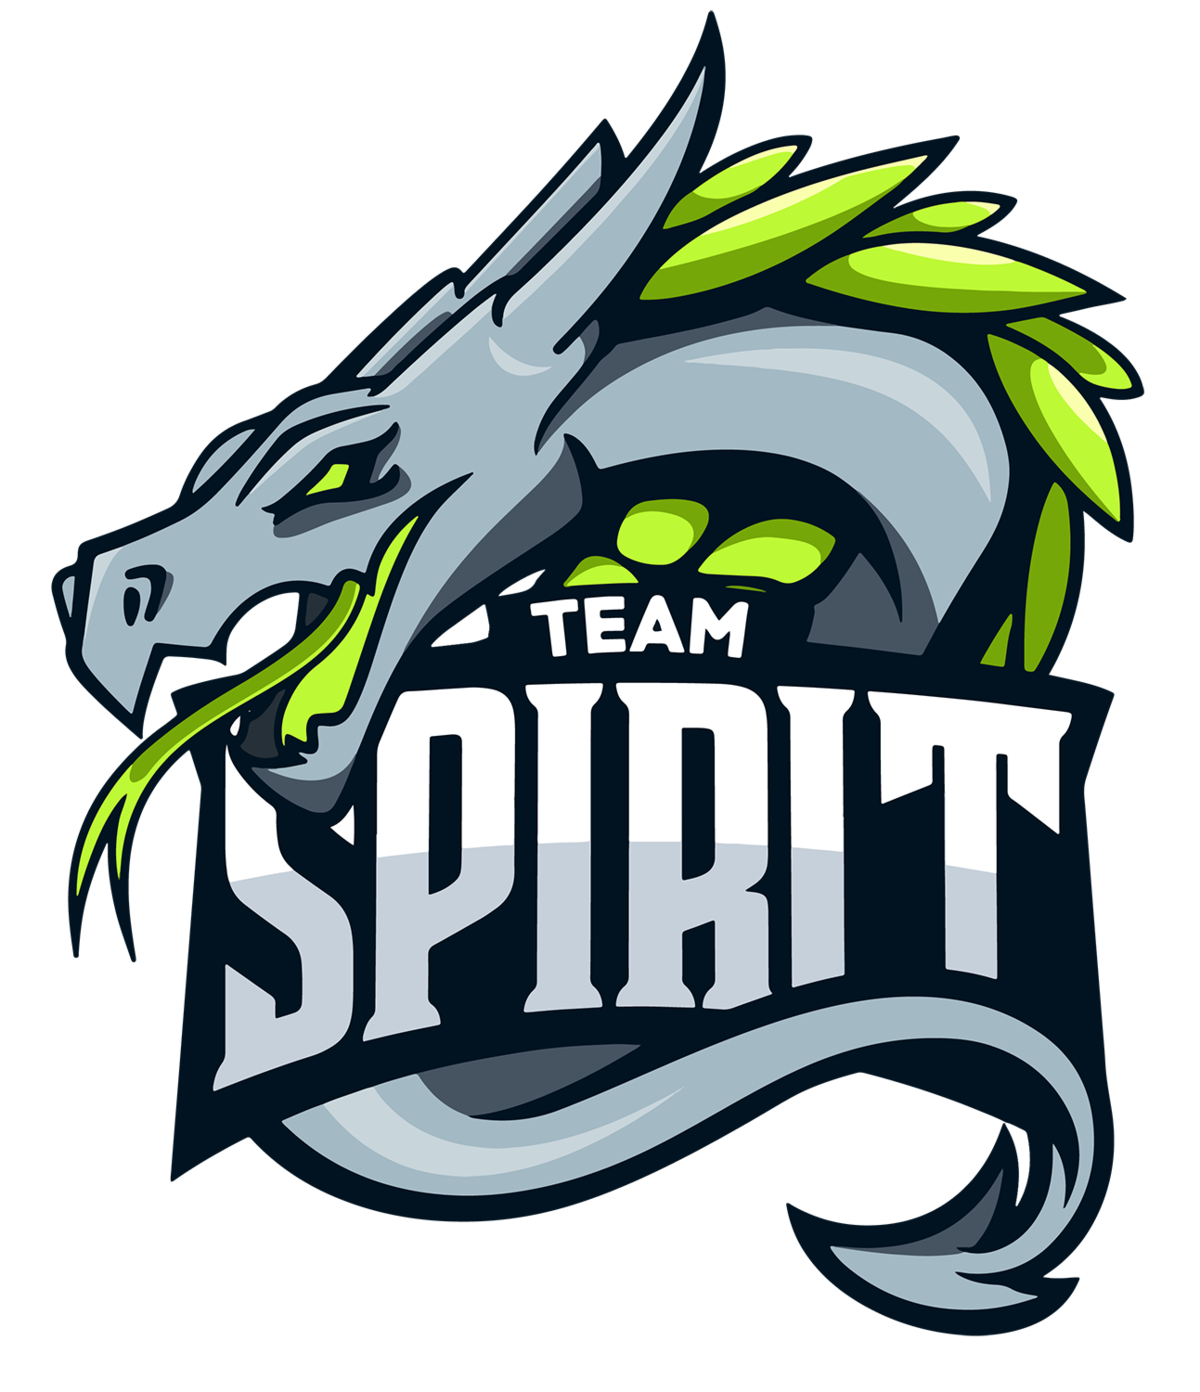 Team spirit wiki . Youtube clipart dota 2